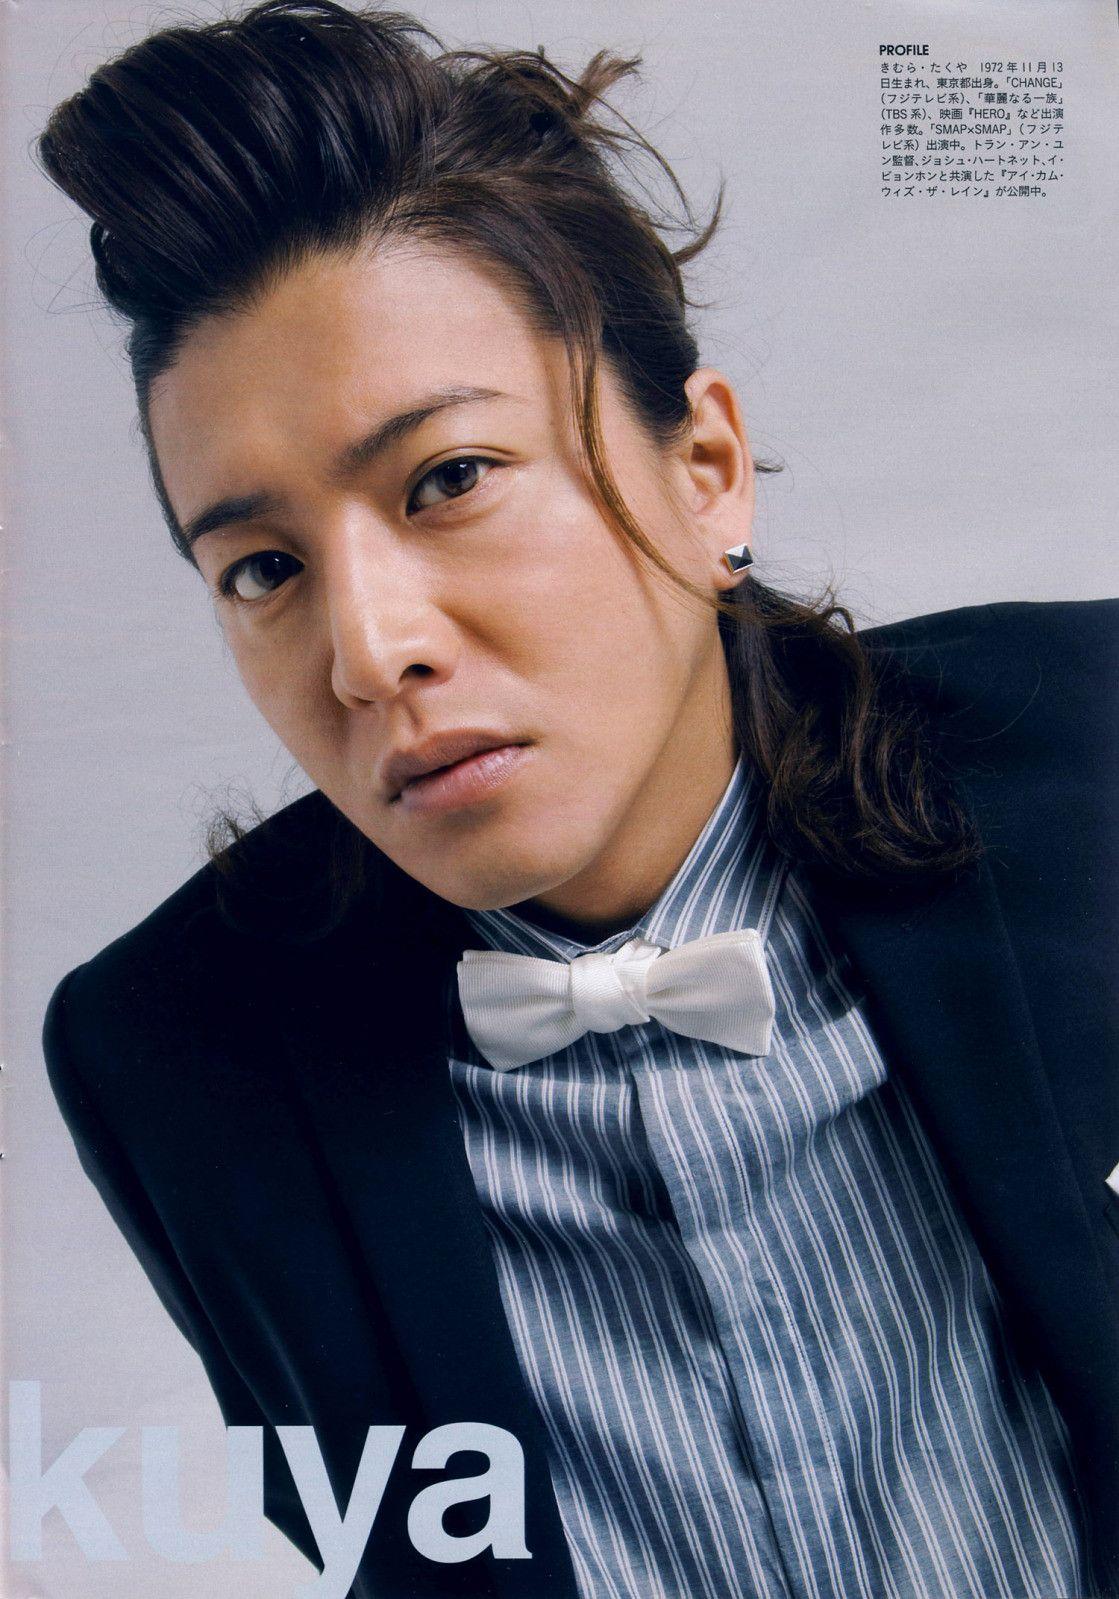 Fuwd5l 2020 キムタク 髪型 男優 セレブ